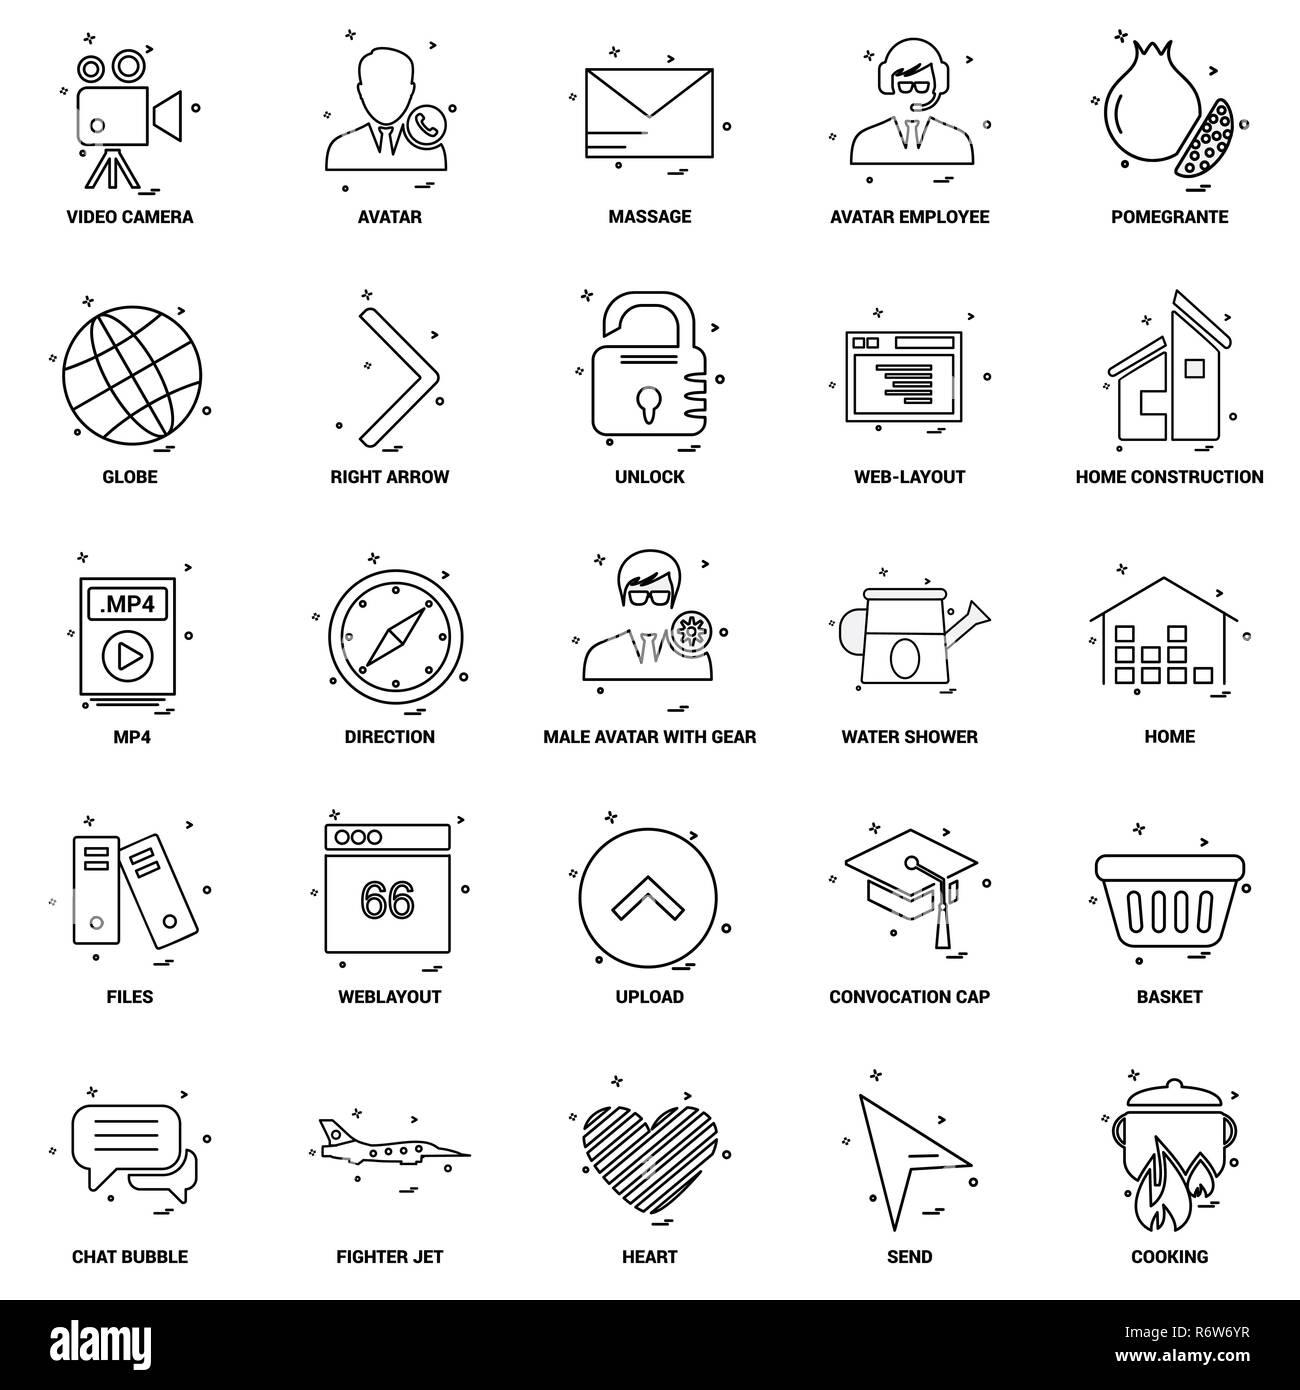 25 Business Concept Mix Line Icon set - Stock Image